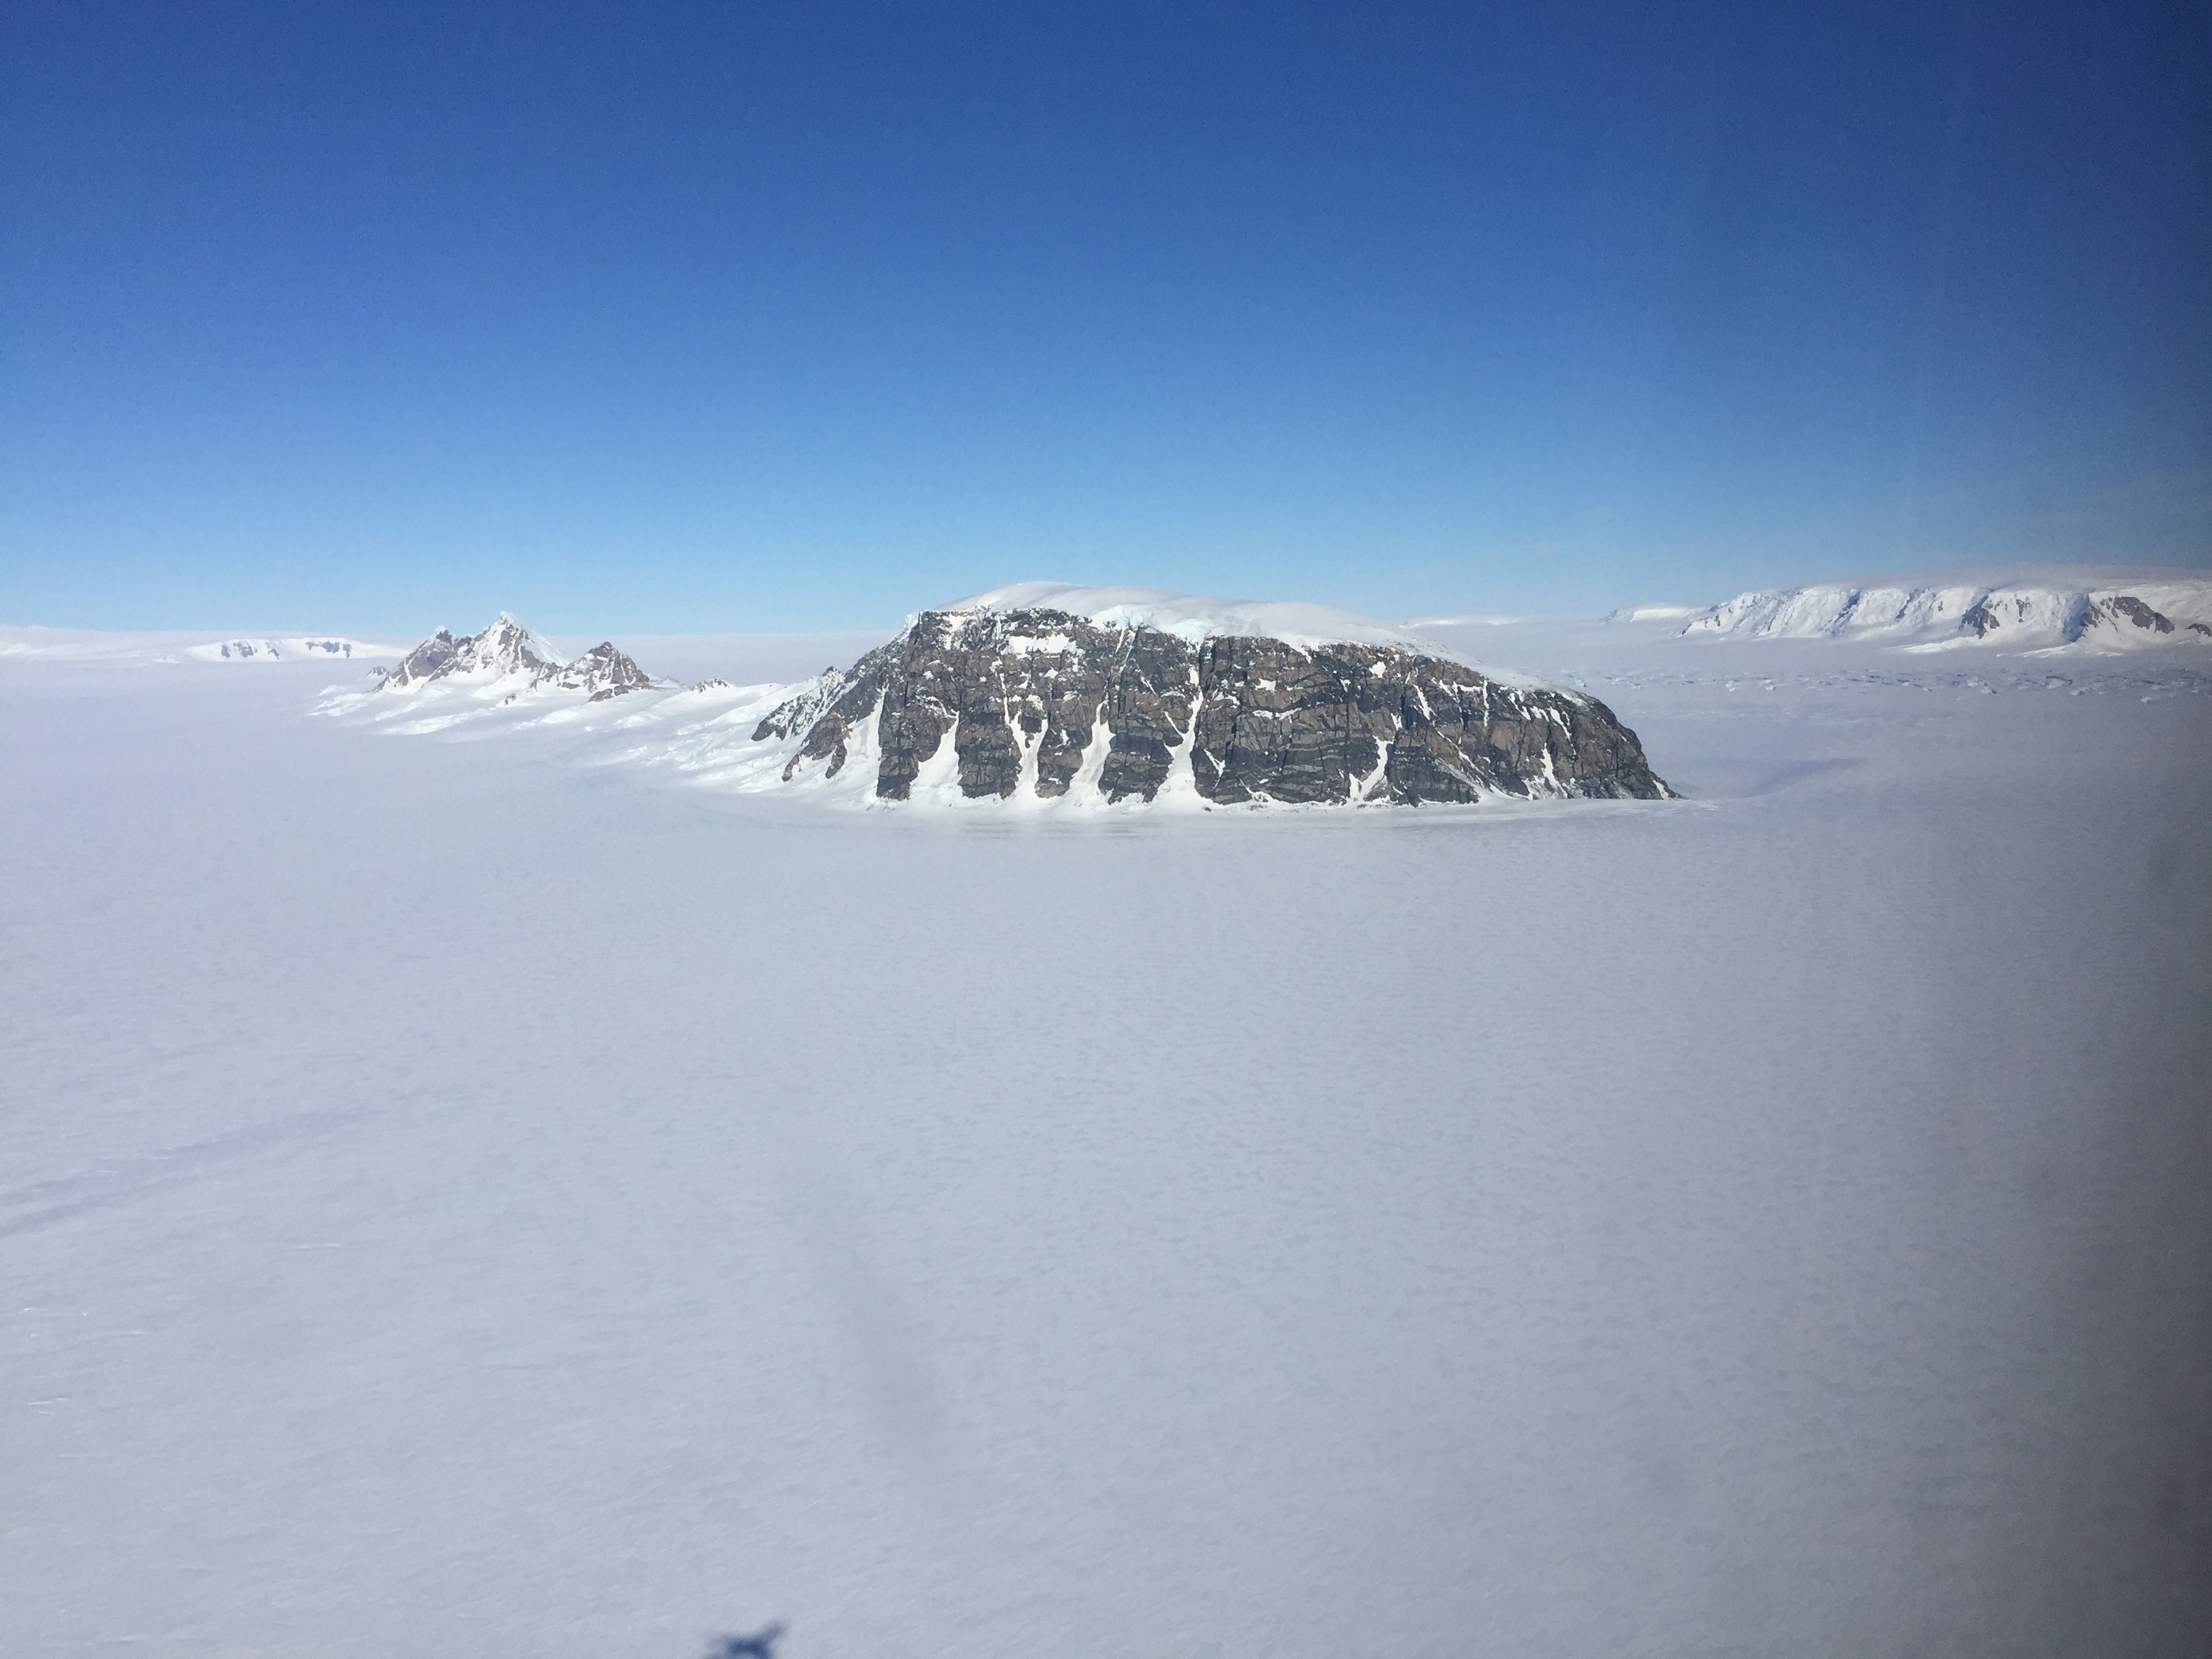 Mount-Prince-Wikipedia.jpg